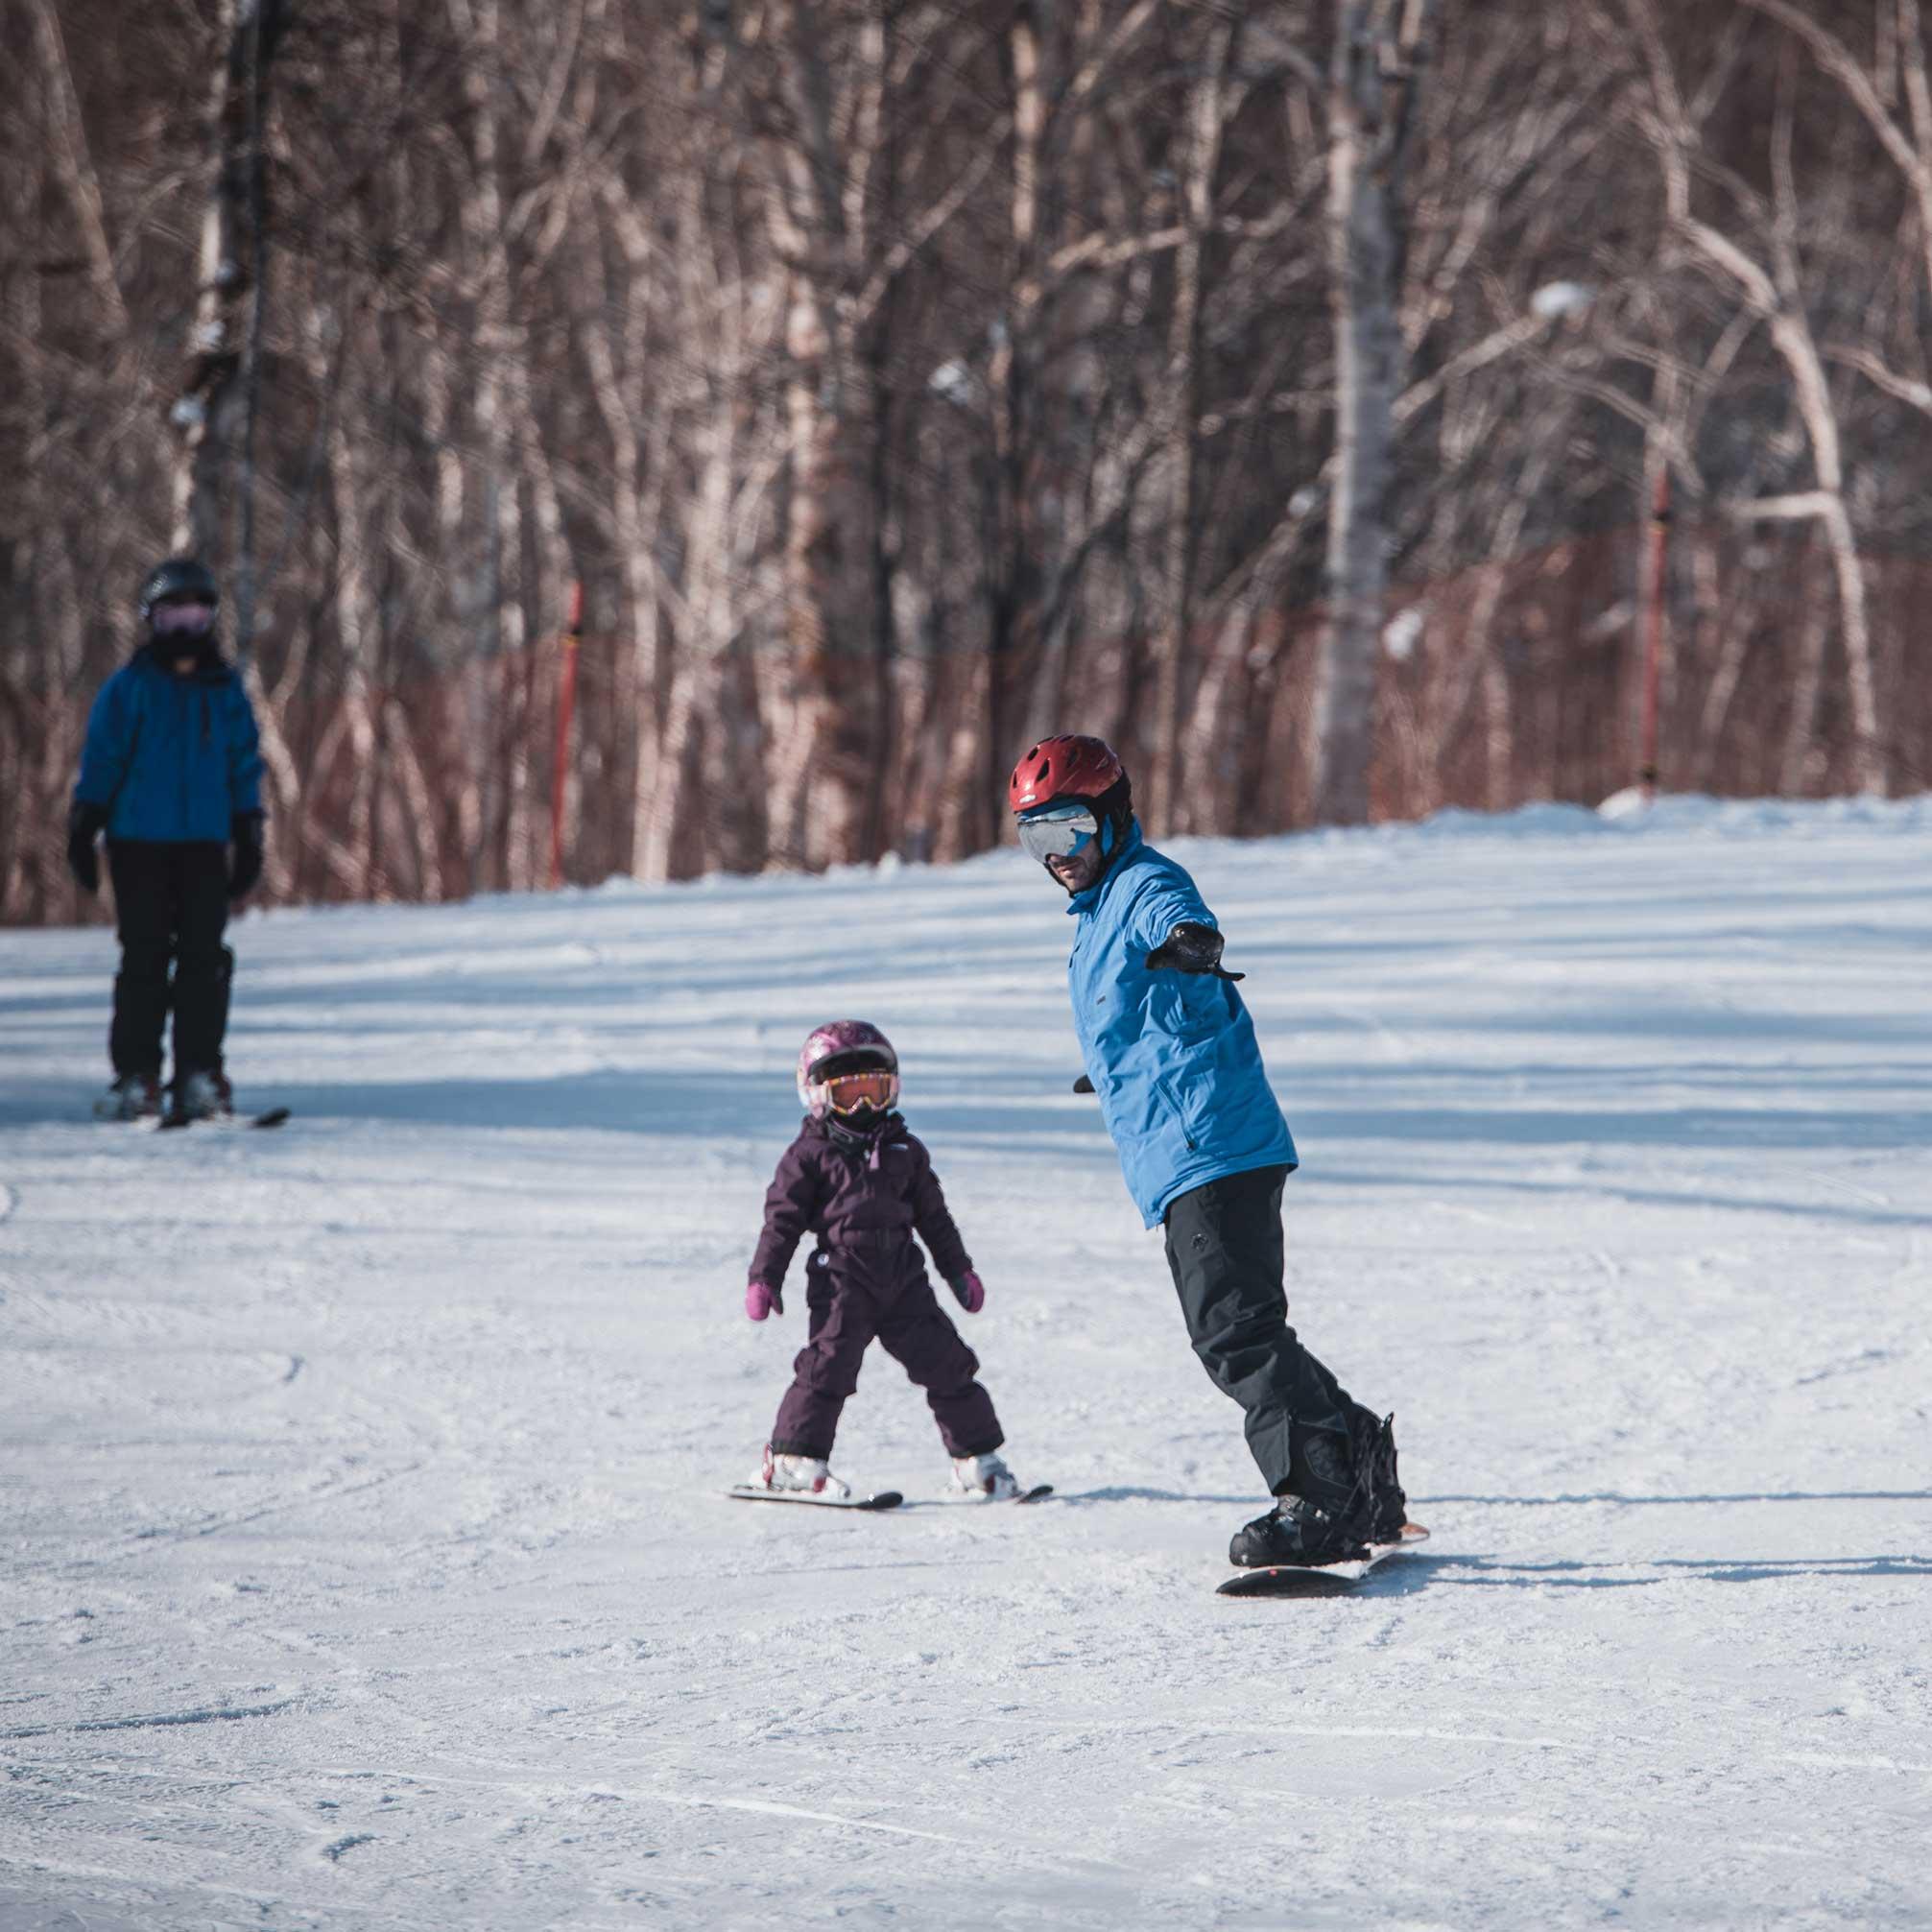 Morning Private Snowboard Lesson